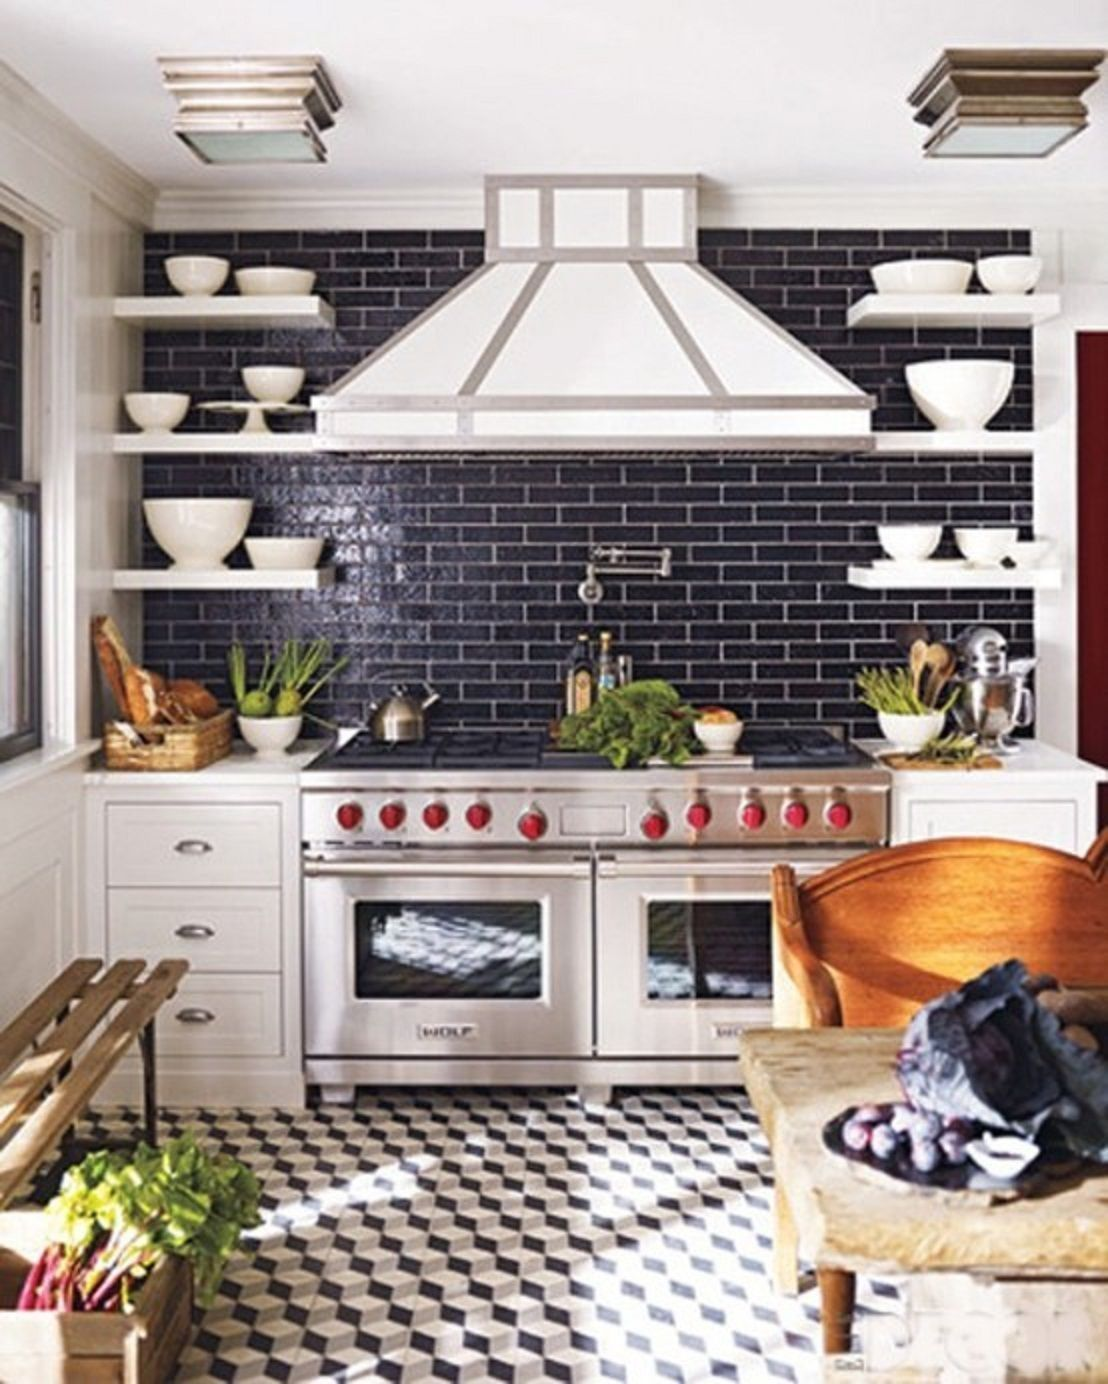 Clean And Classic Subway Tile Kitchen Backsplash Kitchen